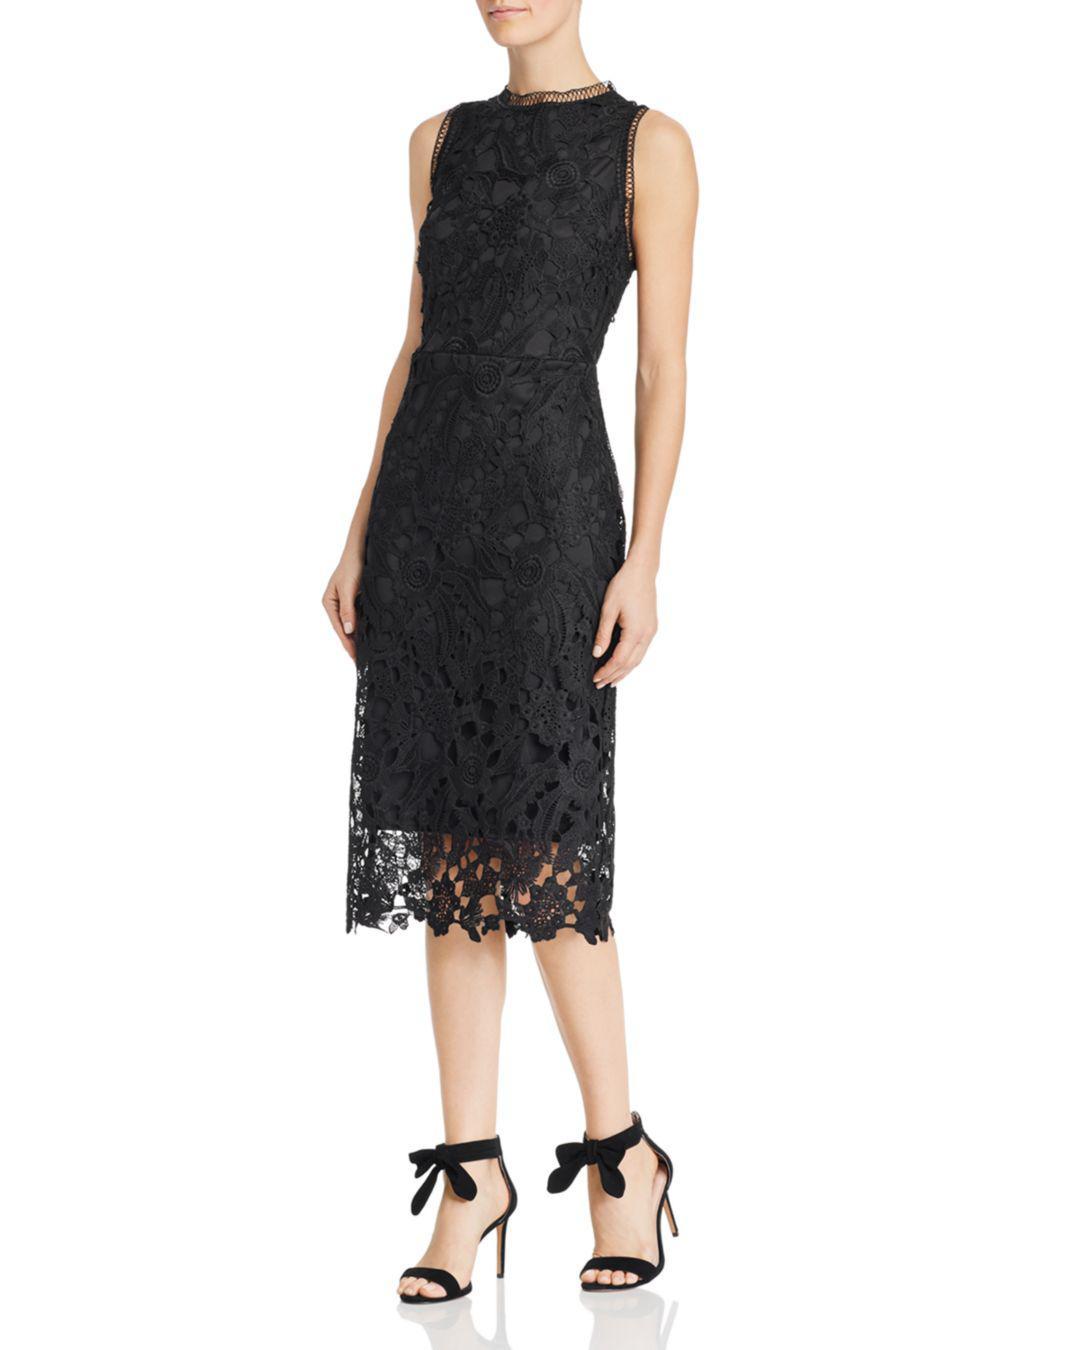 b7335754b Lyst - Sam Edelman Peacock Lace Midi Dress in Black